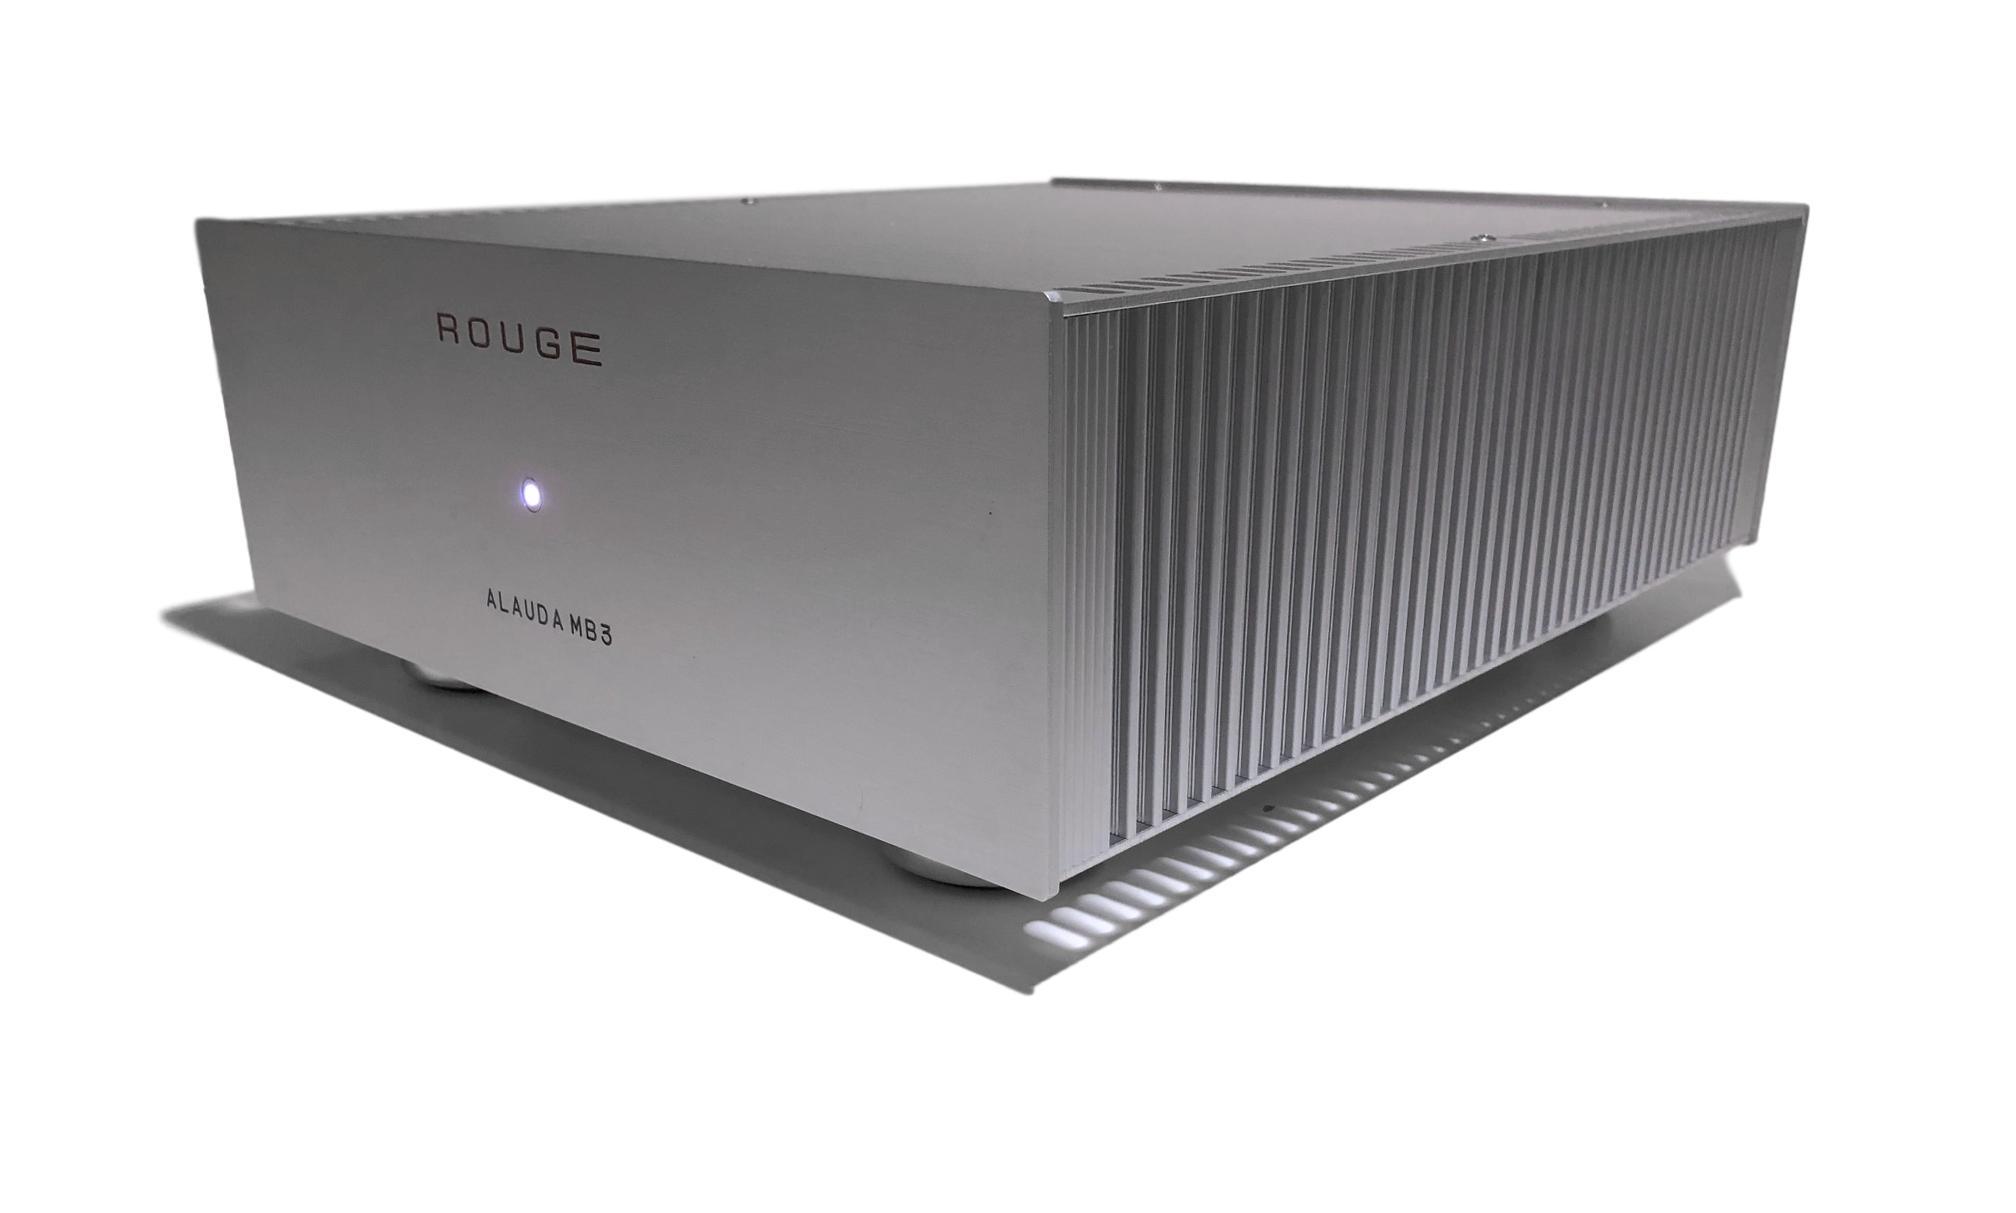 ALAUDA MB-3